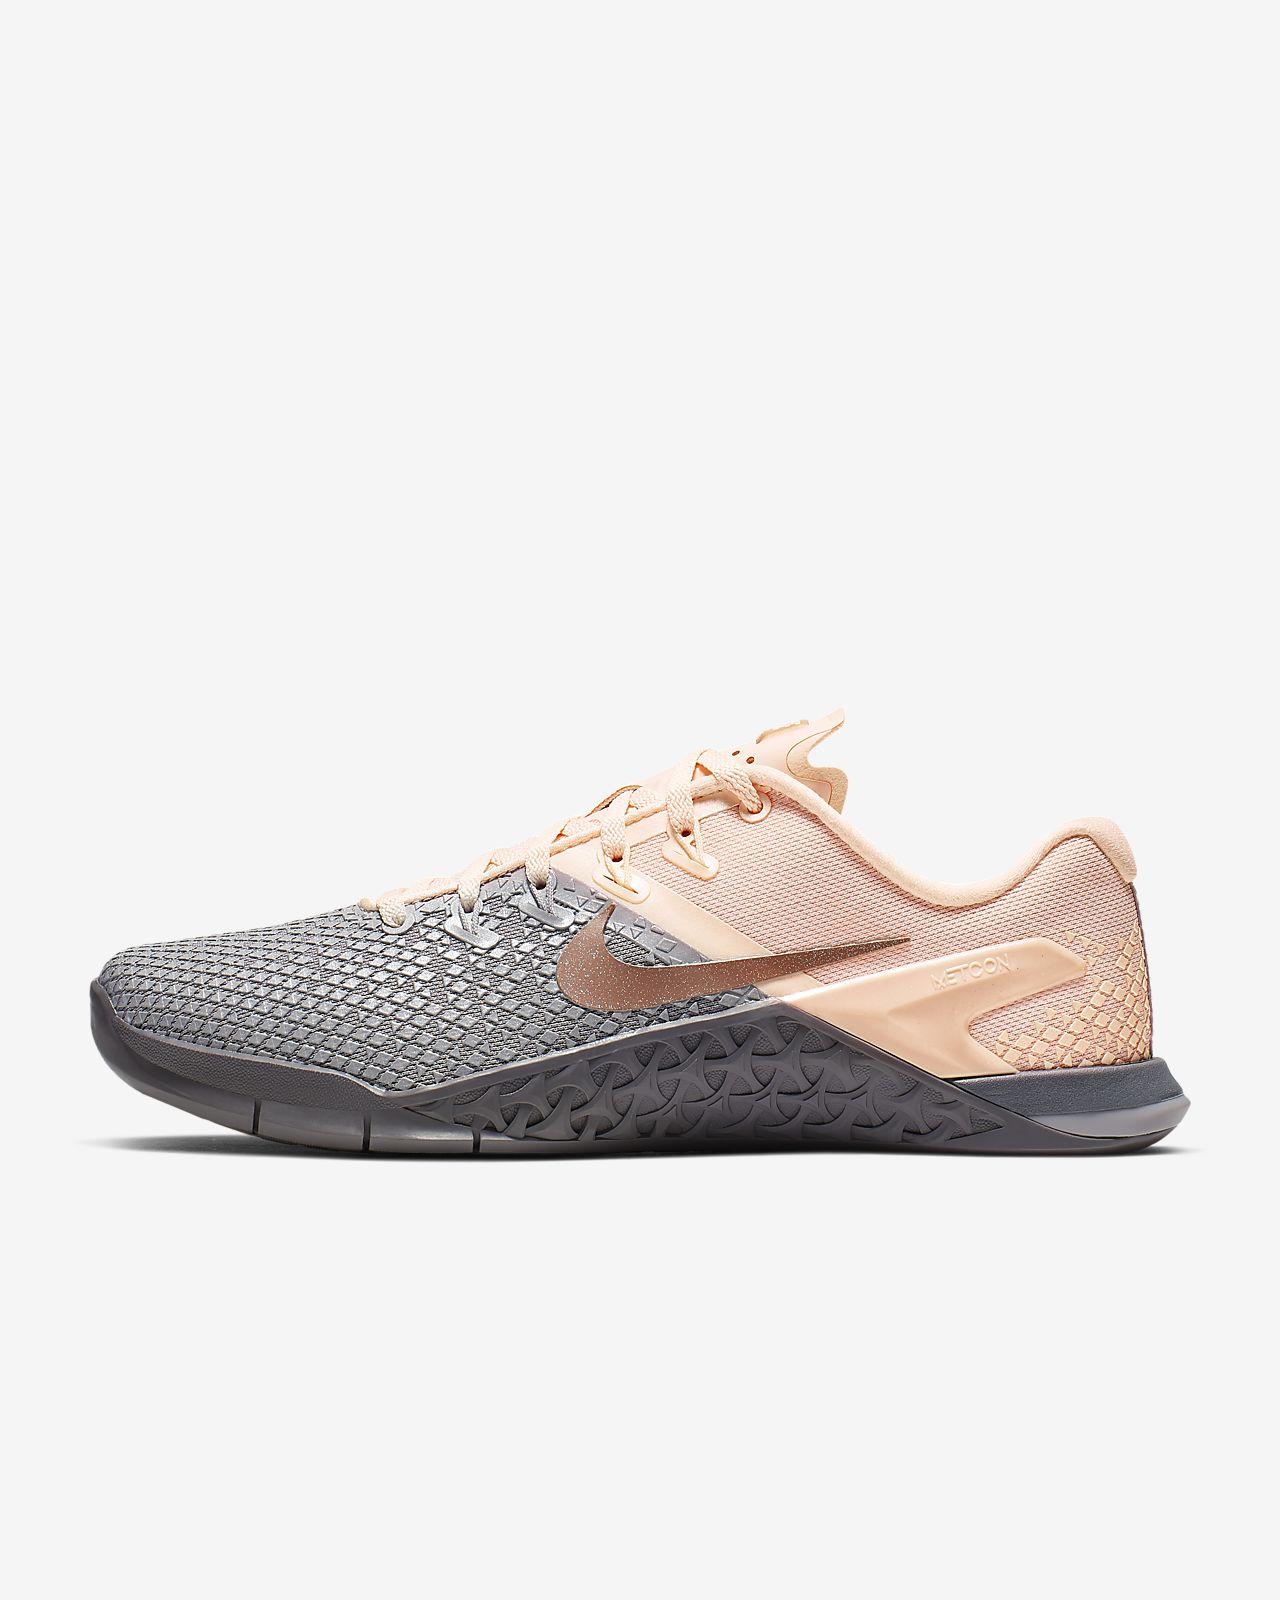 buy popular 2fc96 ee1ab ... Chaussure de cross-training et de renforcement musculaire Nike Metcon 4  XD Metallic pour Femme